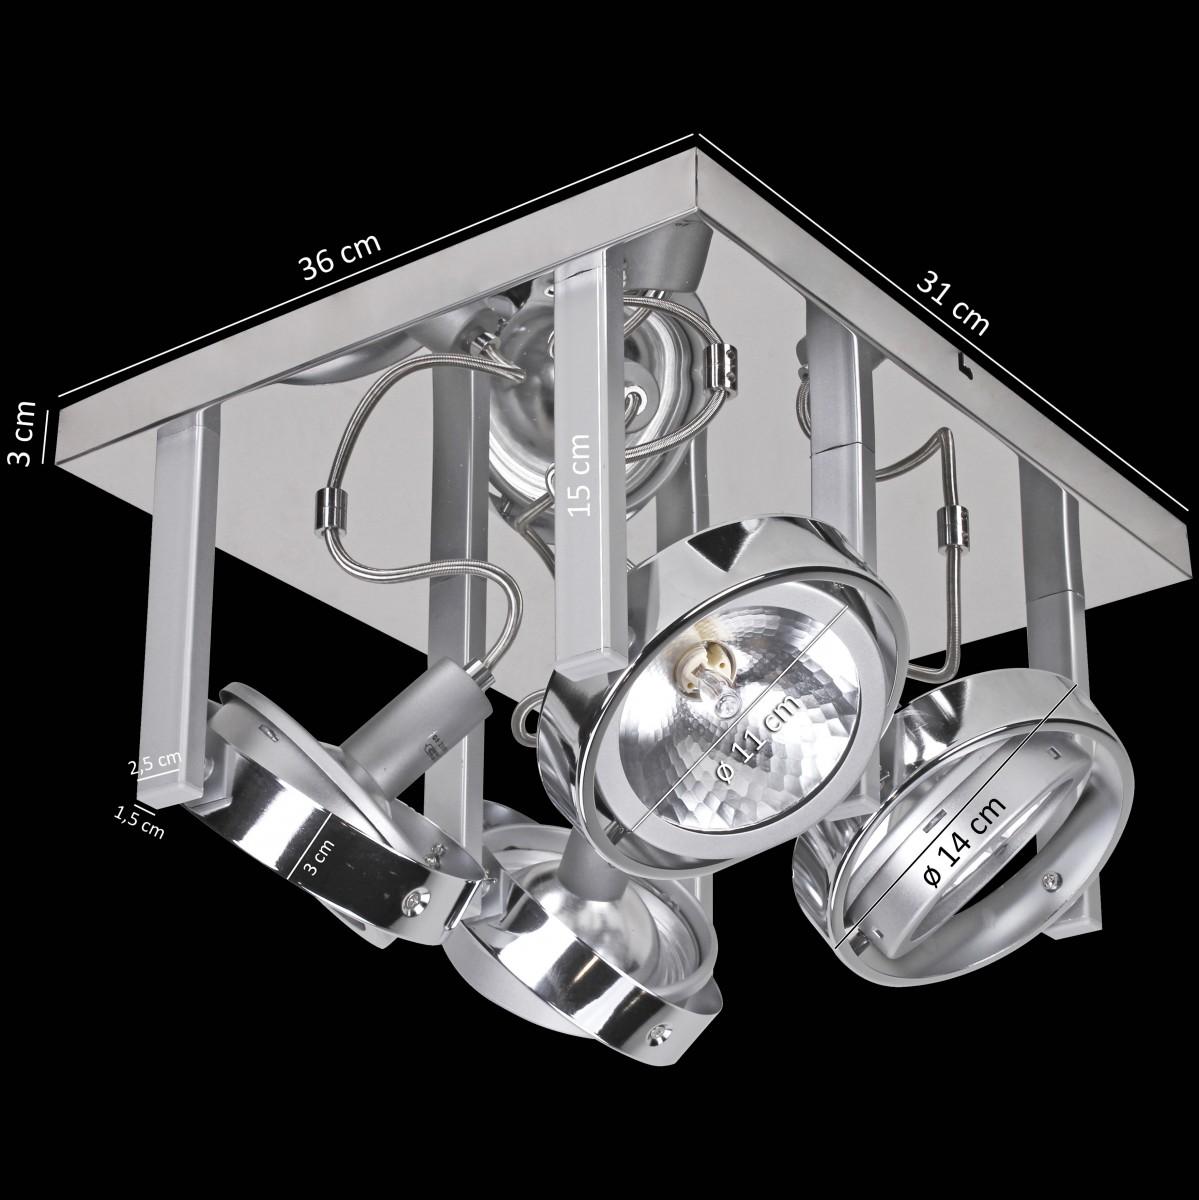 Full Size of Deckenlampe Schlafzimmer Lampe Holz Pinterest Skandinavisch Led Komplett Poco Landhausstil Weiß Wandlampe Set Wandleuchte Deckenleuchte Günstige Wohnzimmer Schlafzimmer Deckenlampe Schlafzimmer